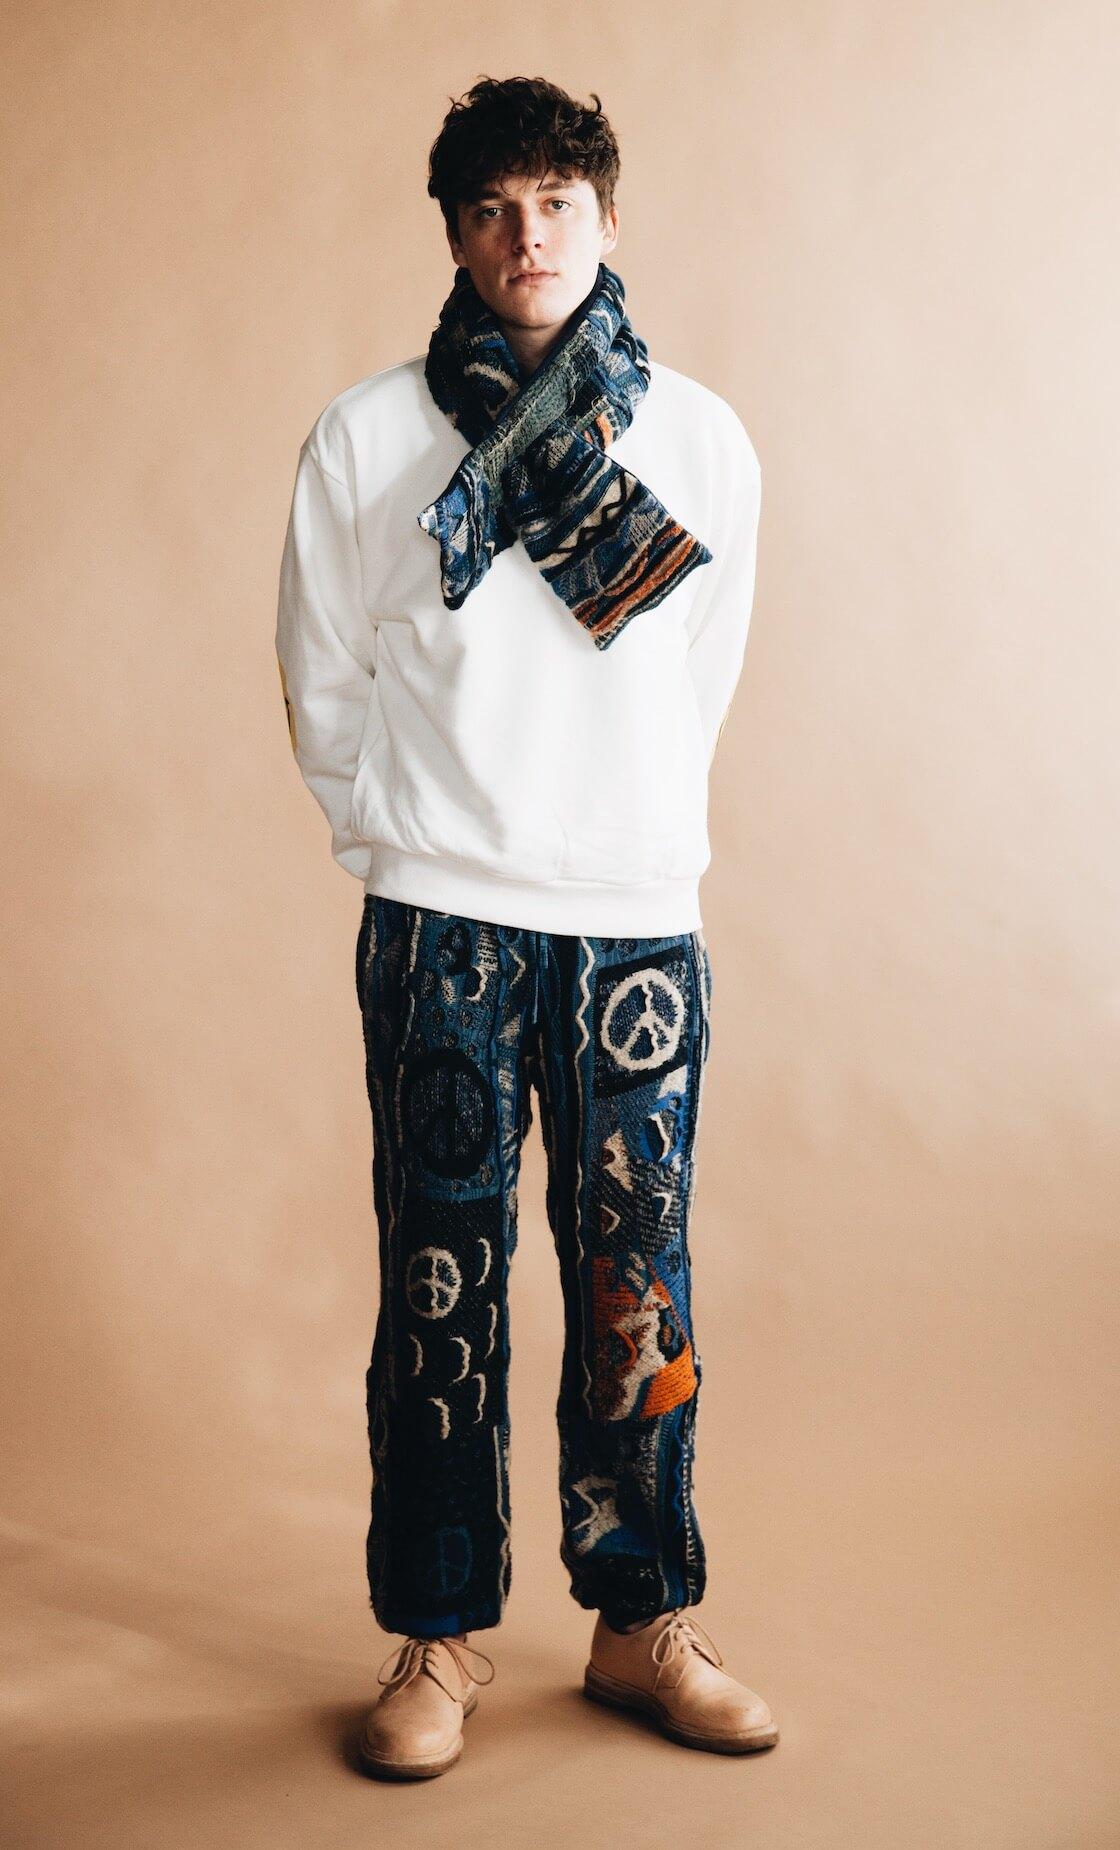 kapital eco jersey (smilie elbow) sweatshirt, 7g knit boro gaudy pants, boro gaudy knit kesa scarf, and hender scheme mip 21 shoes on body